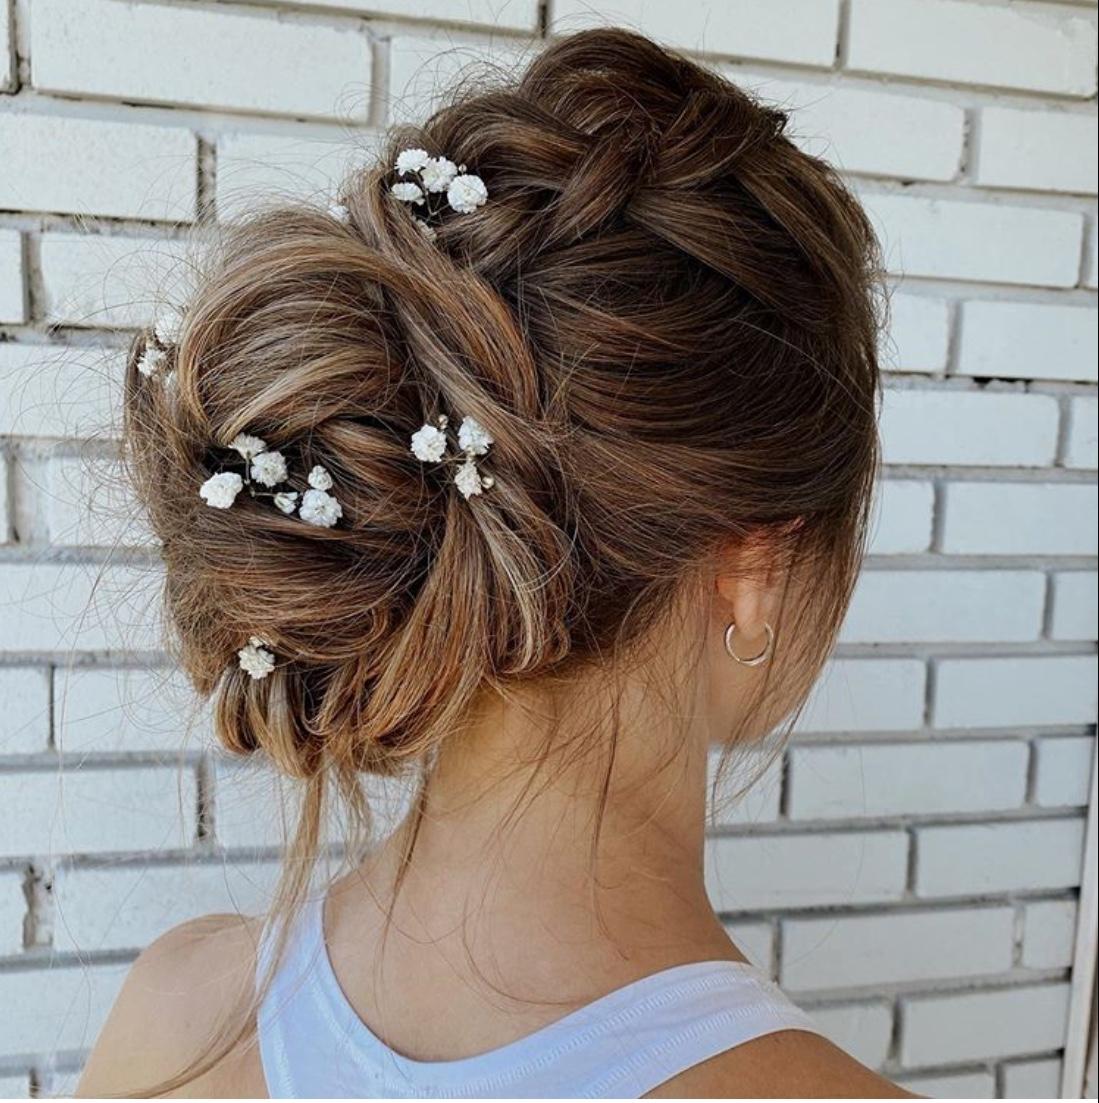 swept-back wedding hairstyles